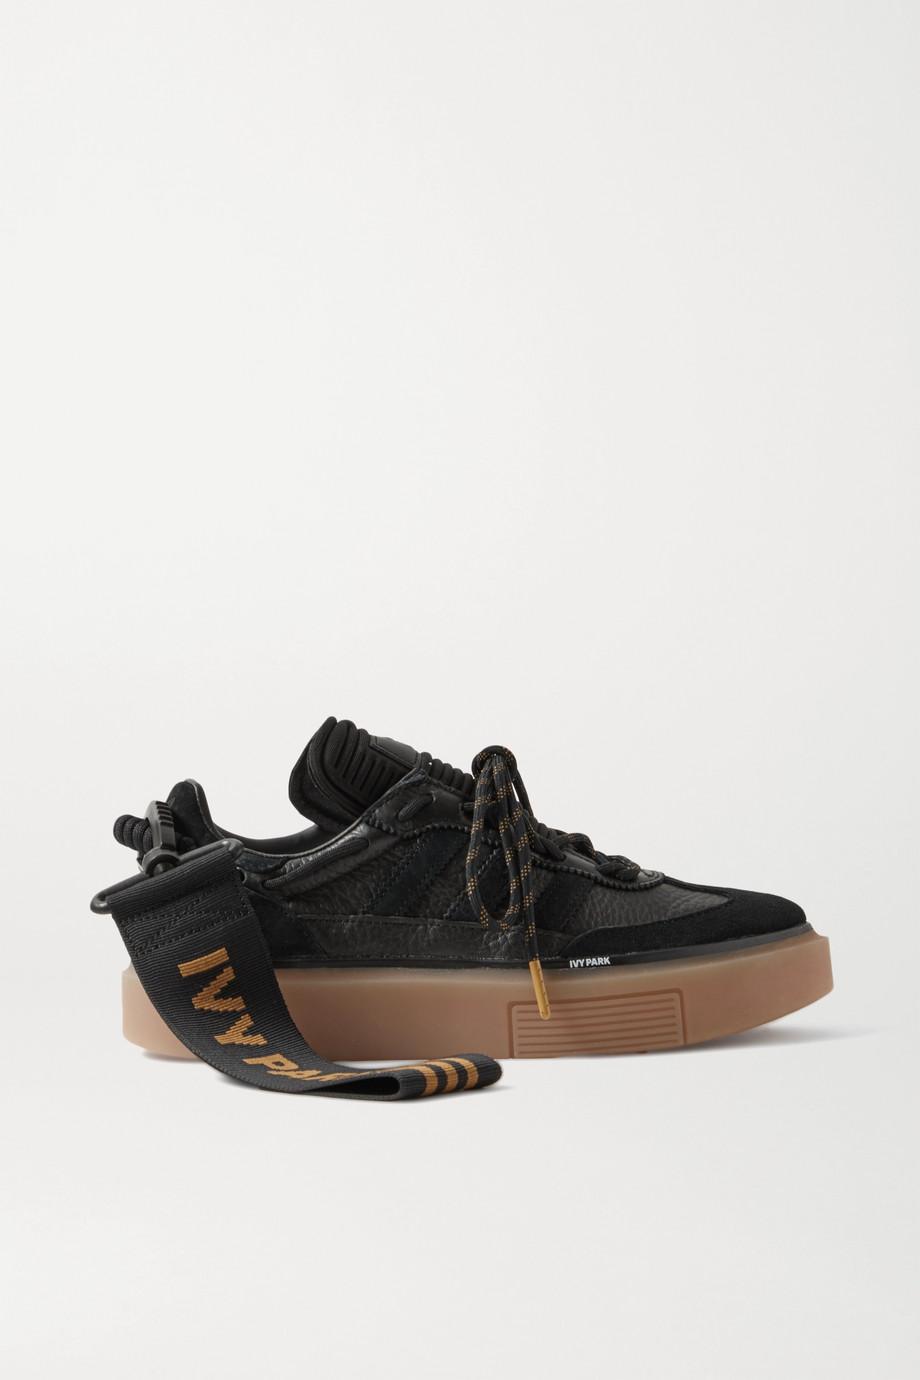 adidas Originals + Ivy Park Supersleek textured-leather, neoprene and suede sneakers